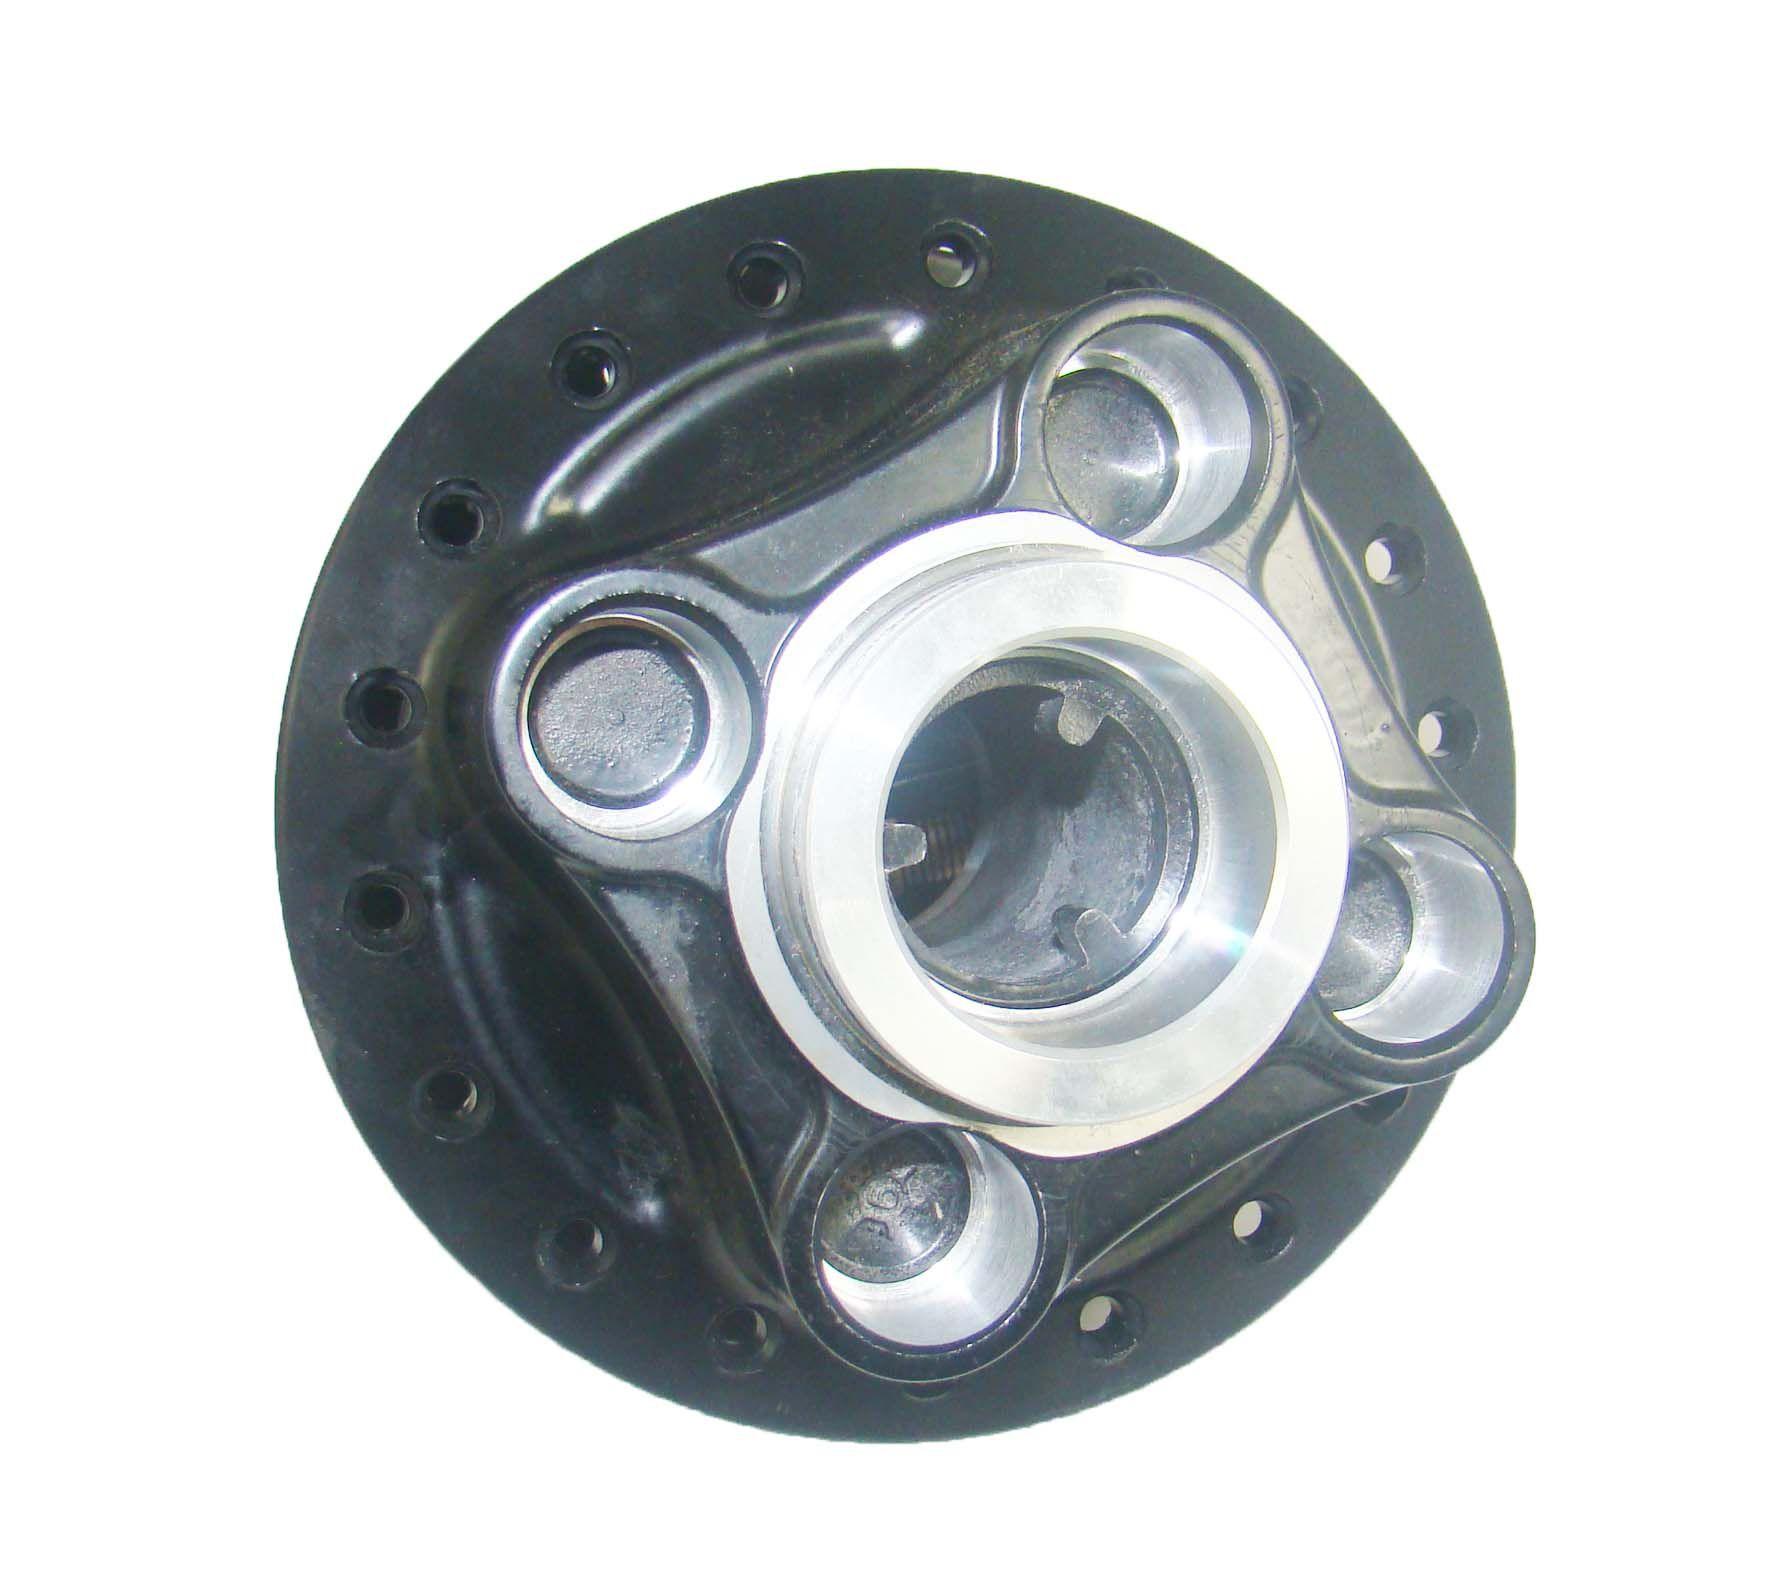 Cubo Roda Nx 150 200 Xlr 125 Tras Modelo Origina 303